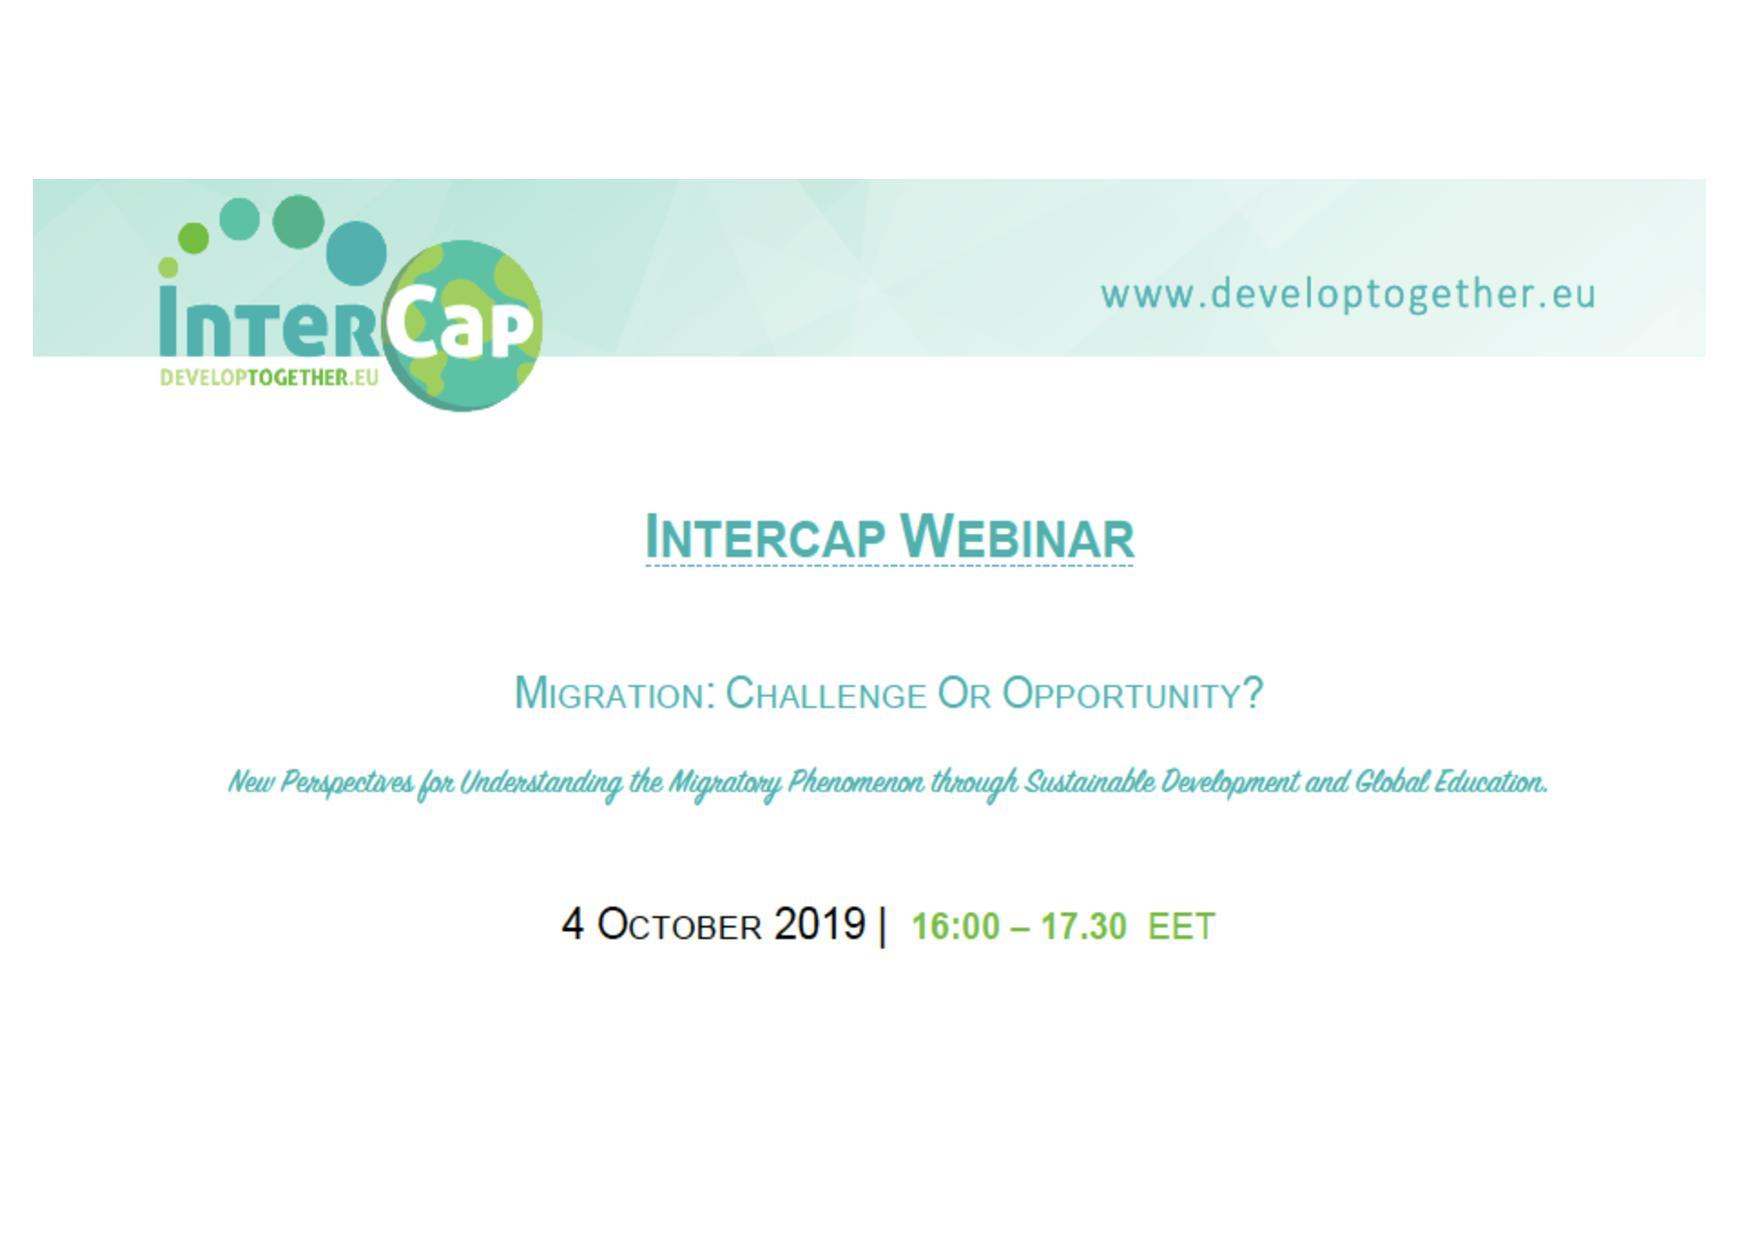 Intercap webinar DDG